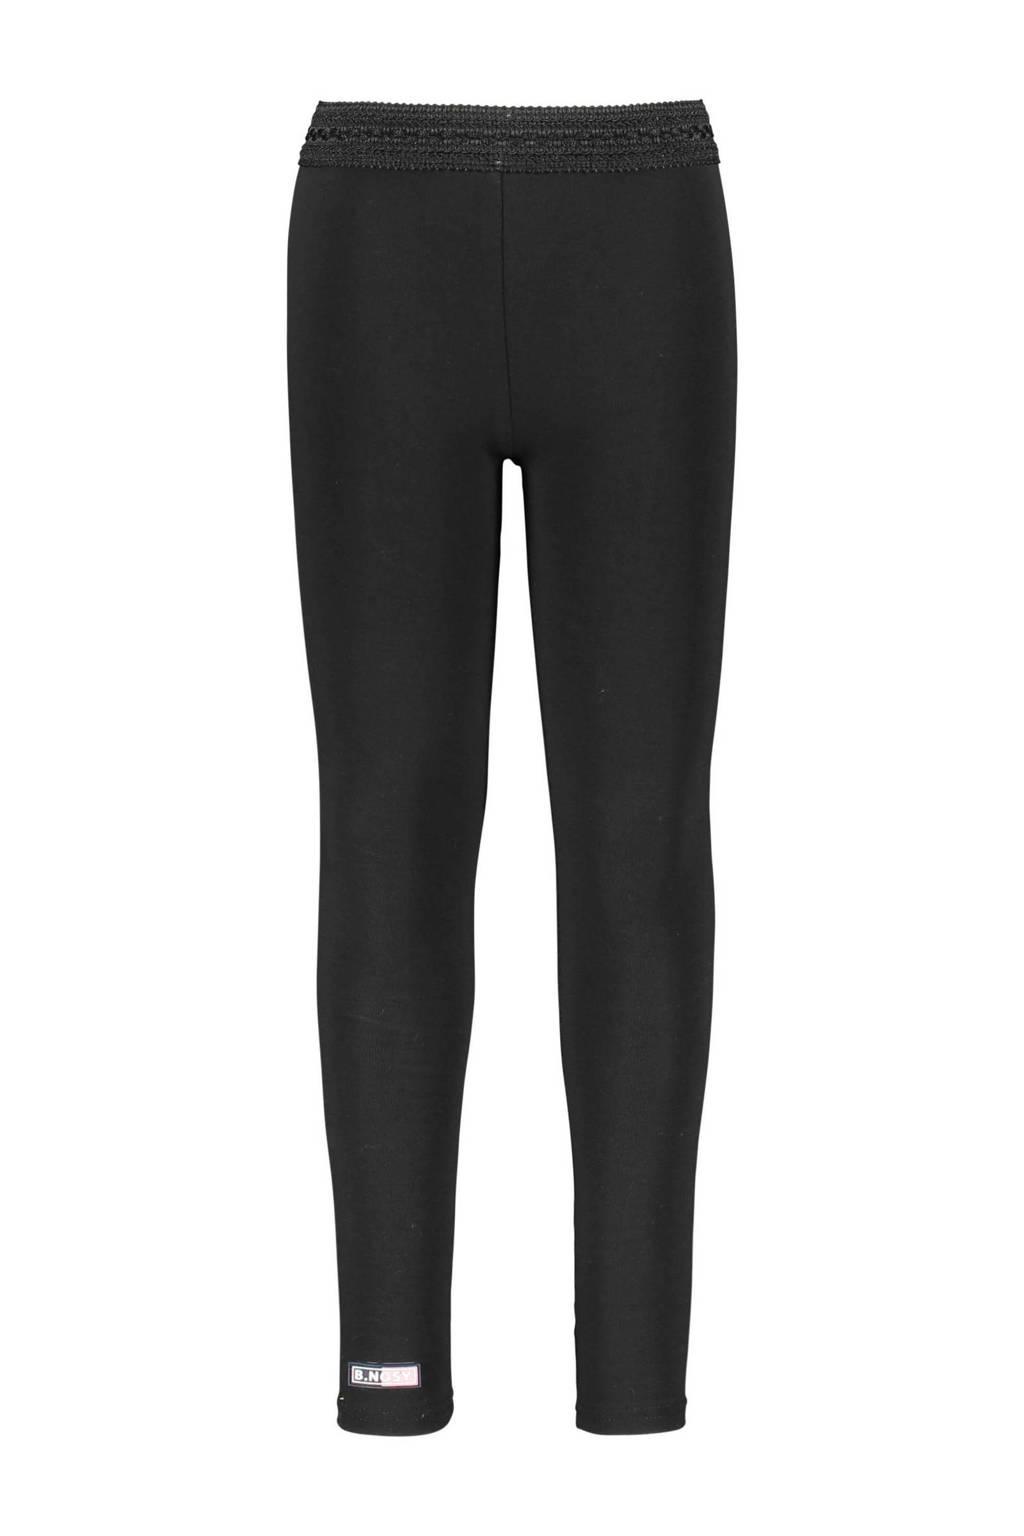 B.Nosy legging zwart, Zwart